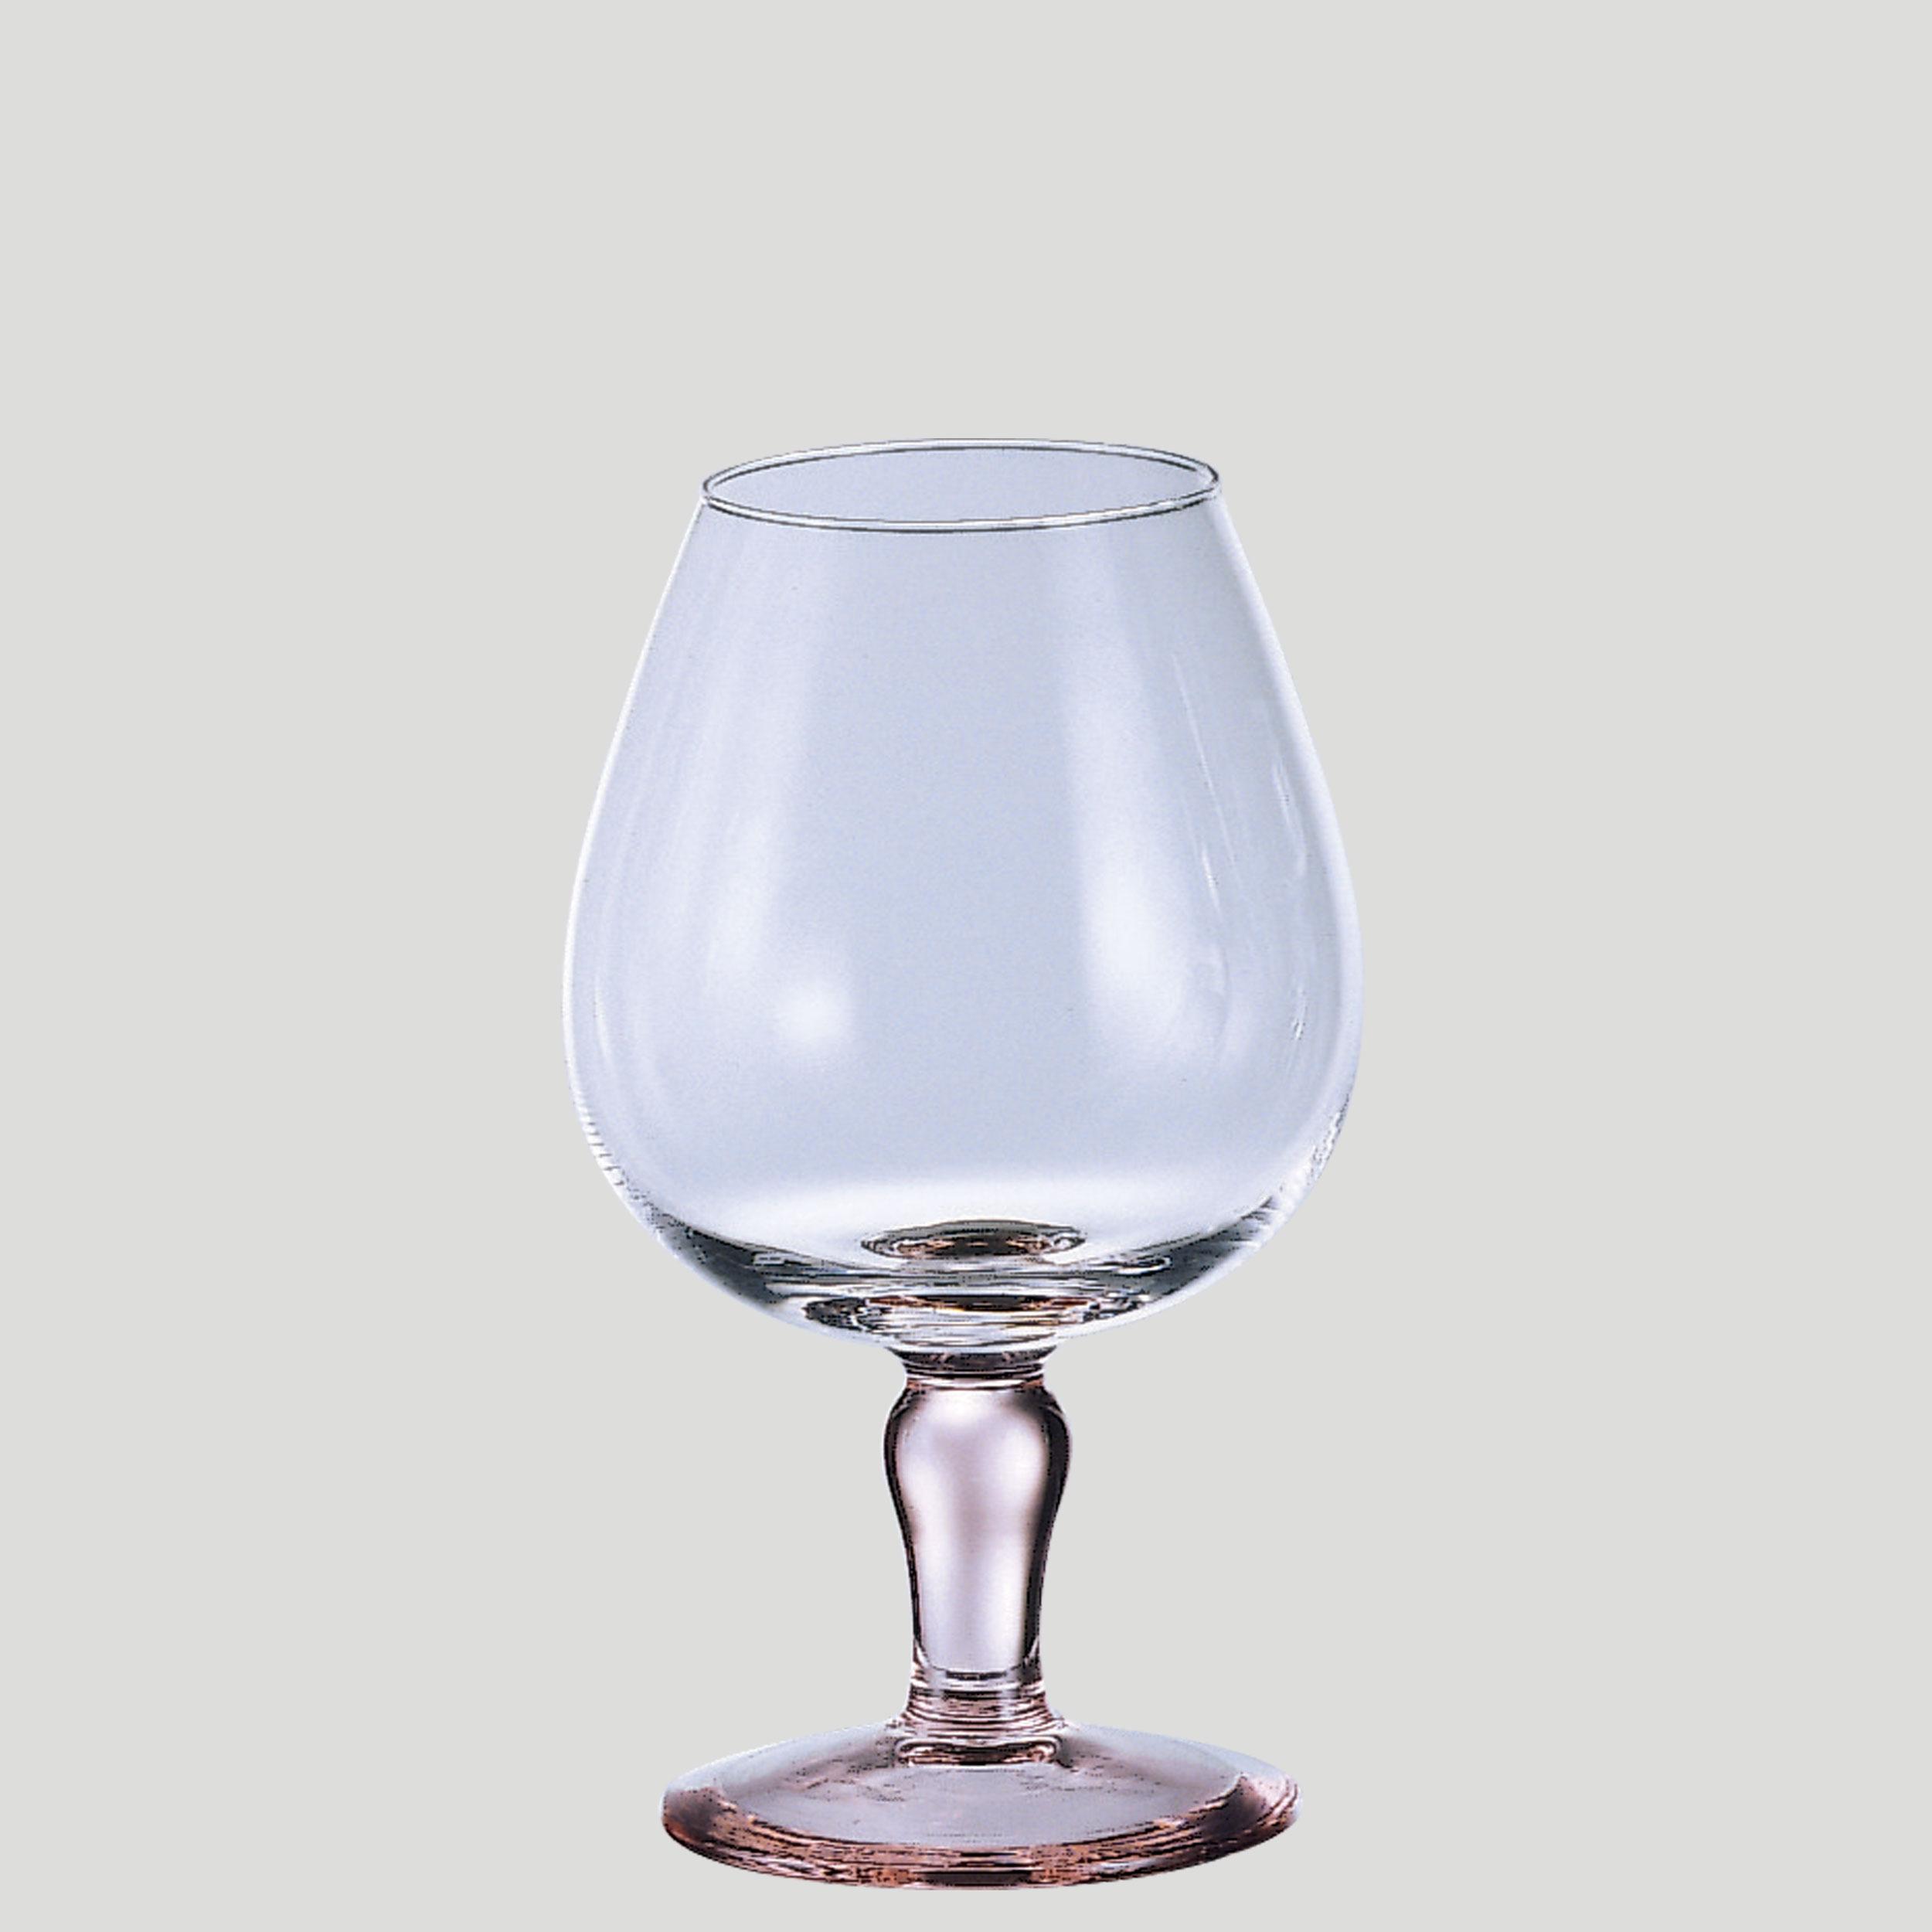 Calice Napoleon - calice in vetro caffetteria - Gardagel